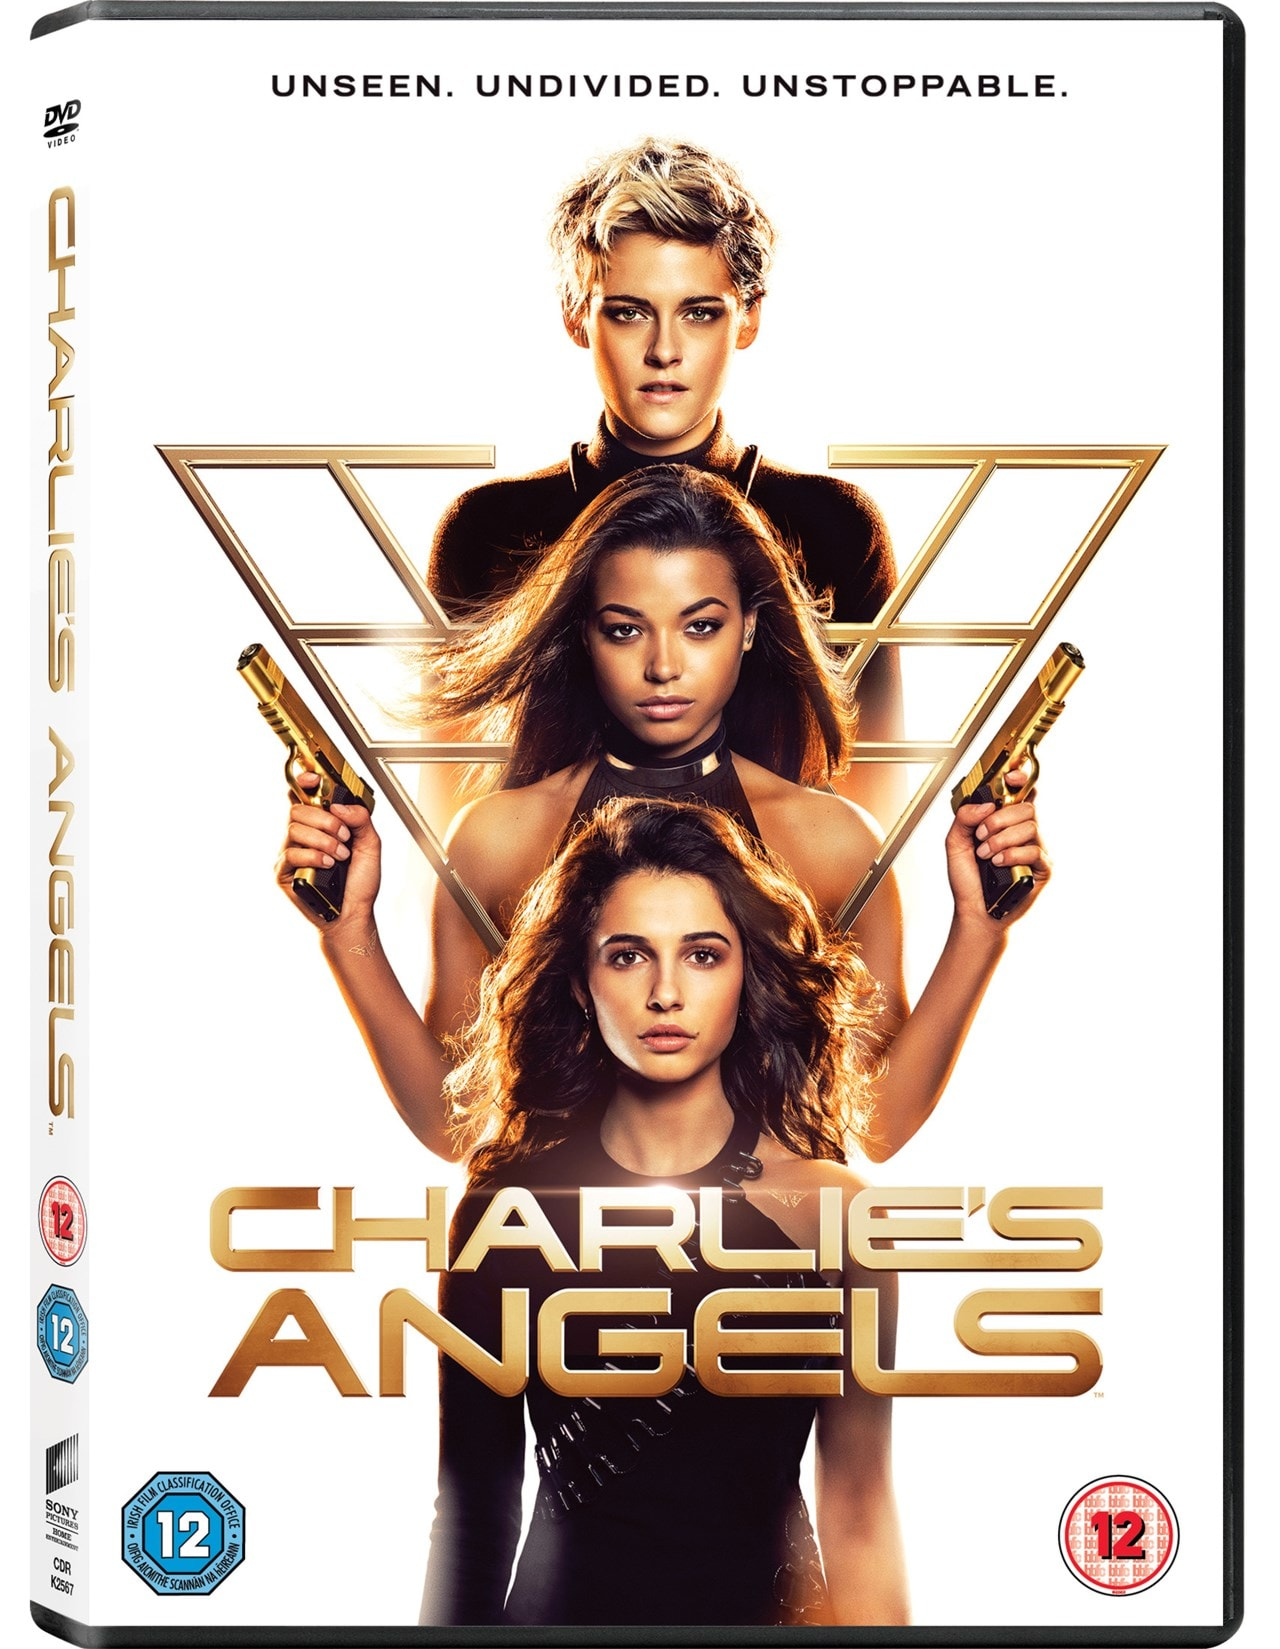 Charlie's Angels - 2